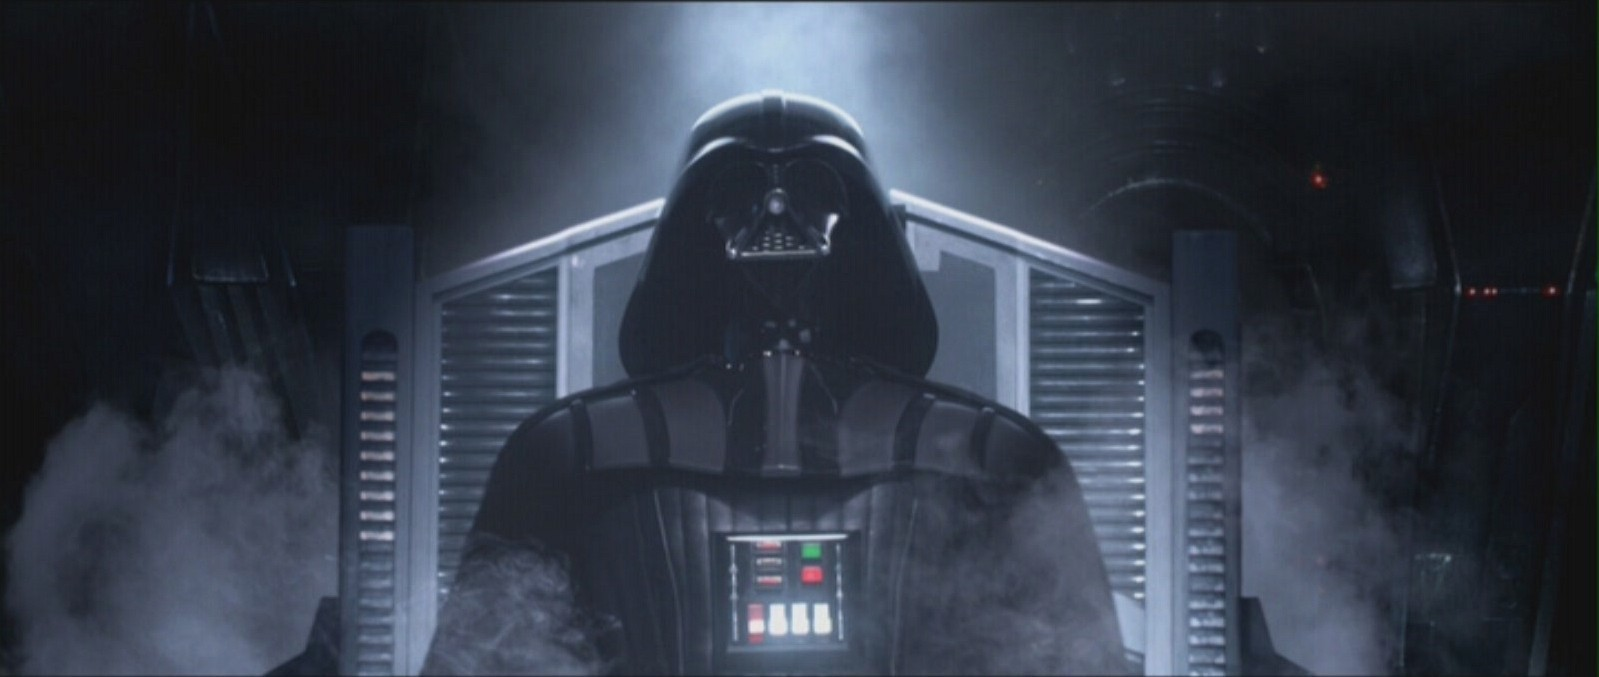 Darth Vader's NO